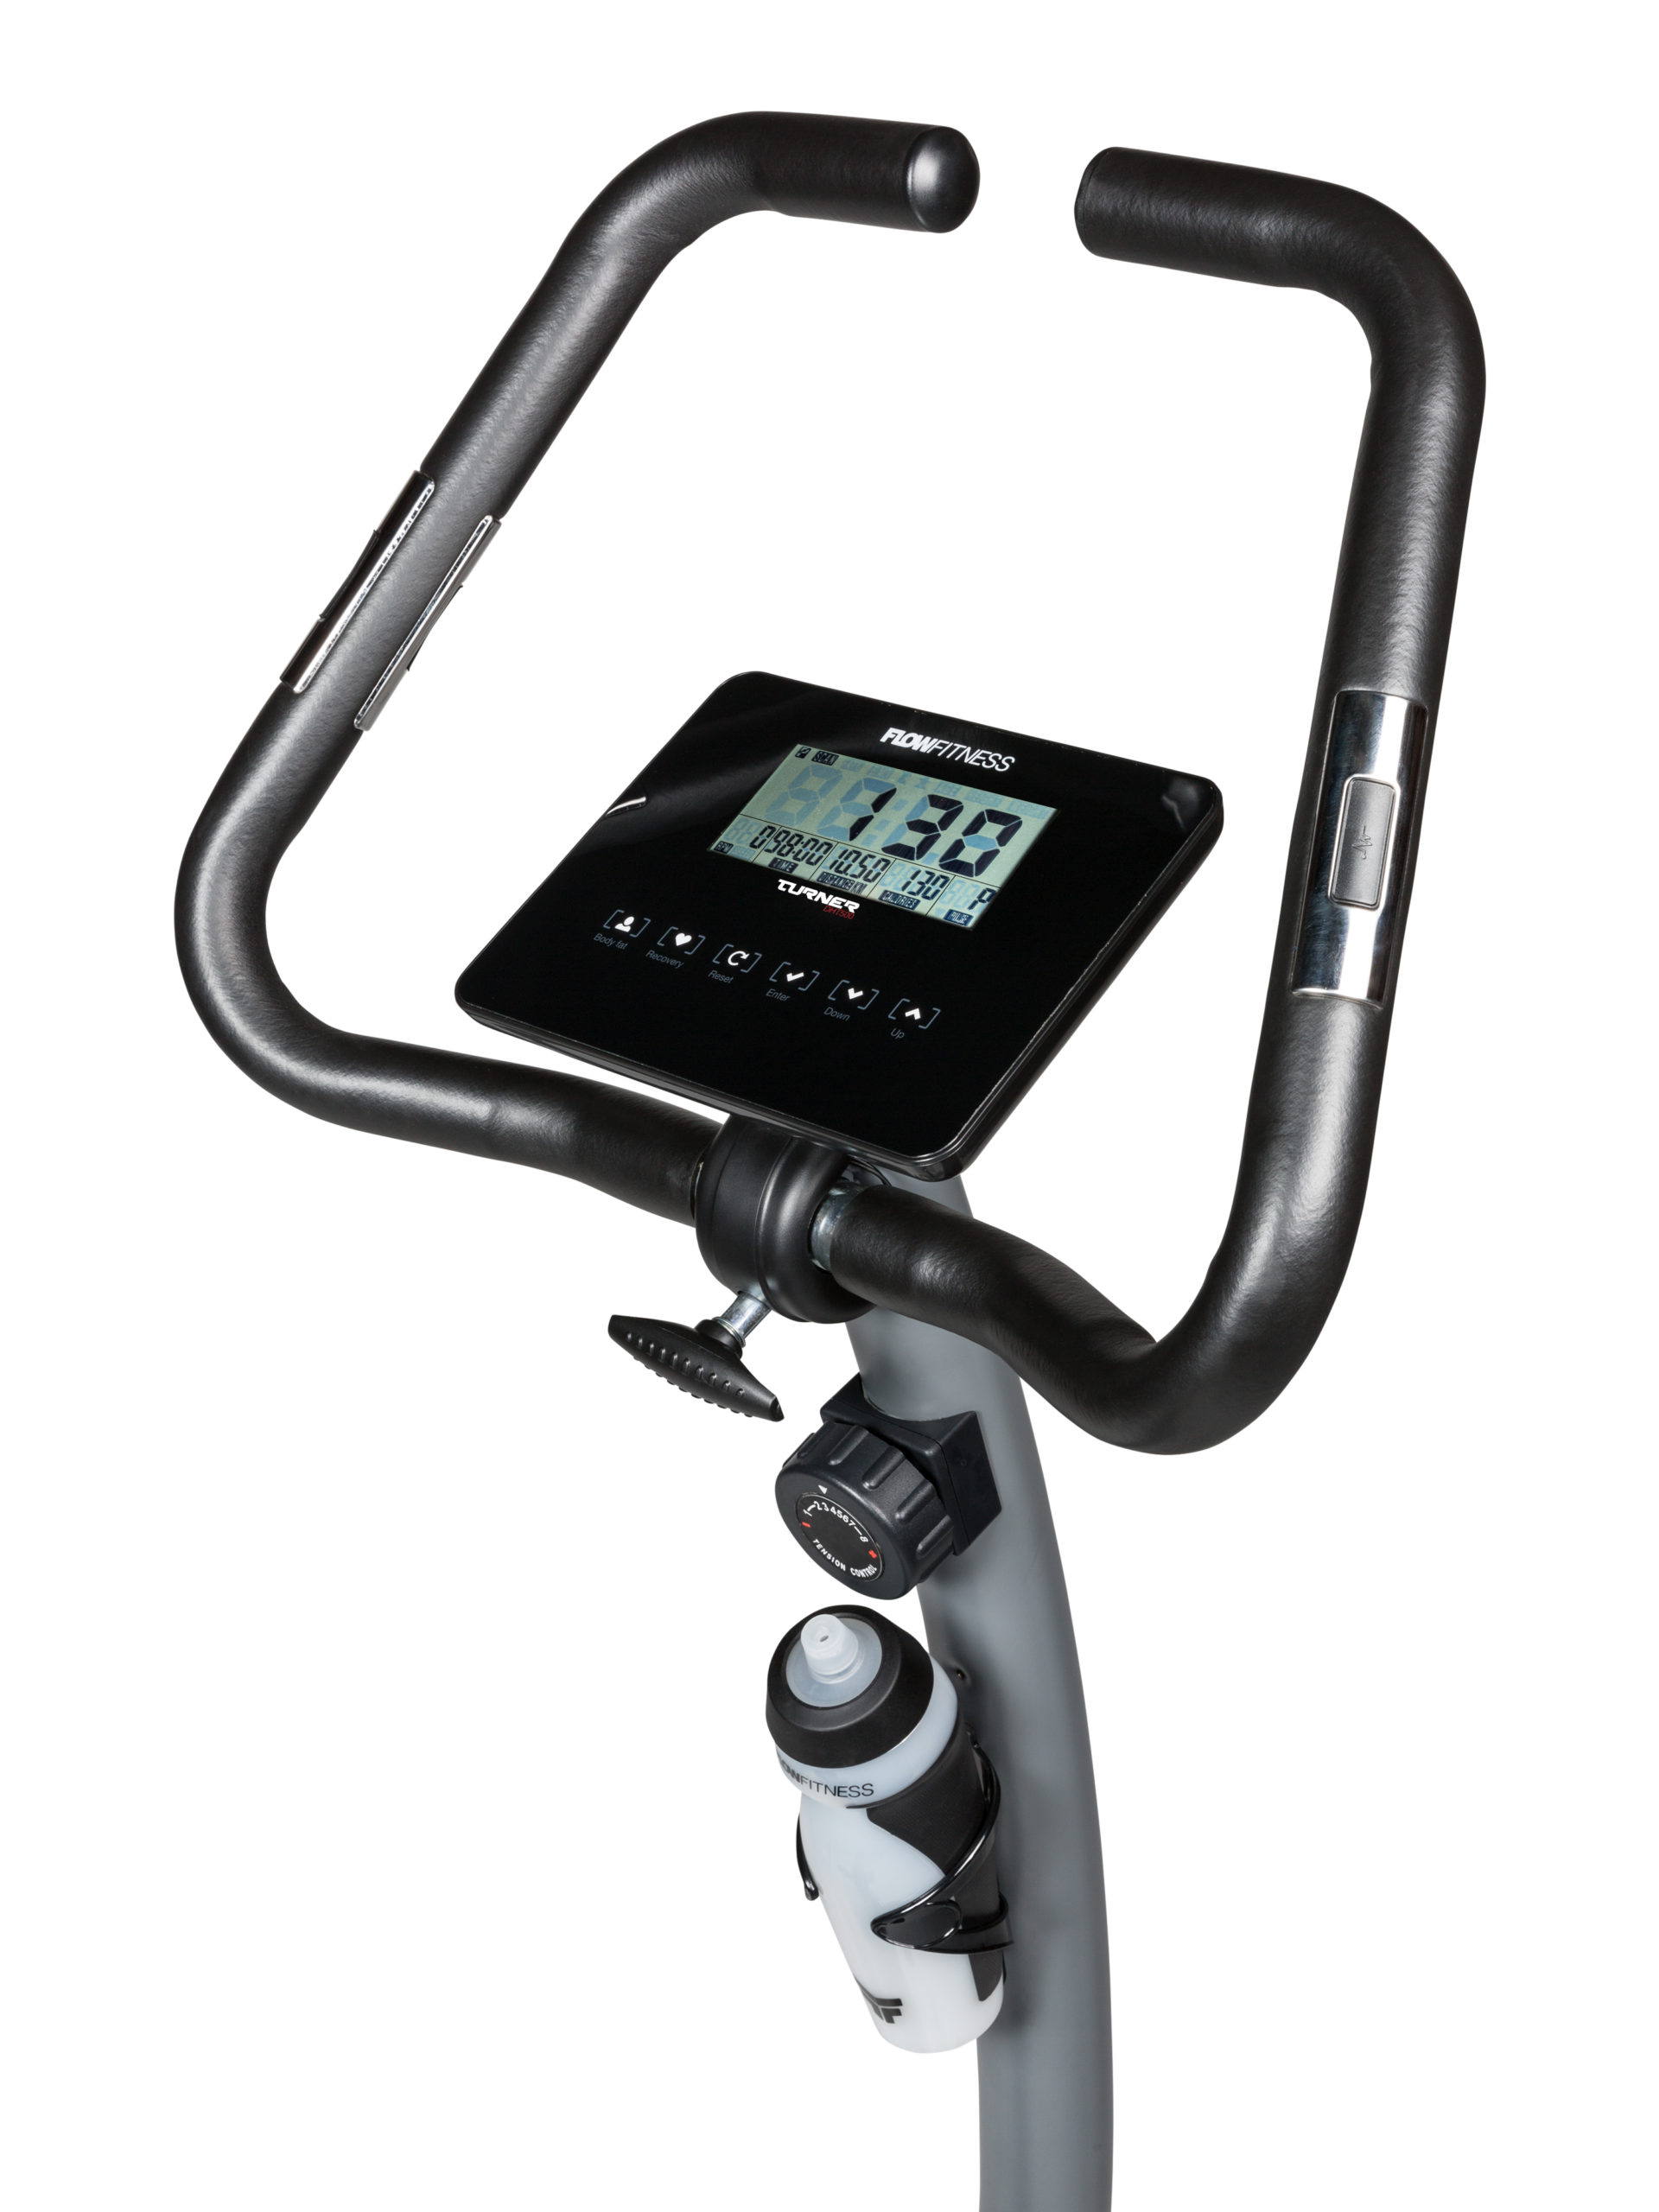 Flow Fitness Tabel Turner DHT500 Hometrainer